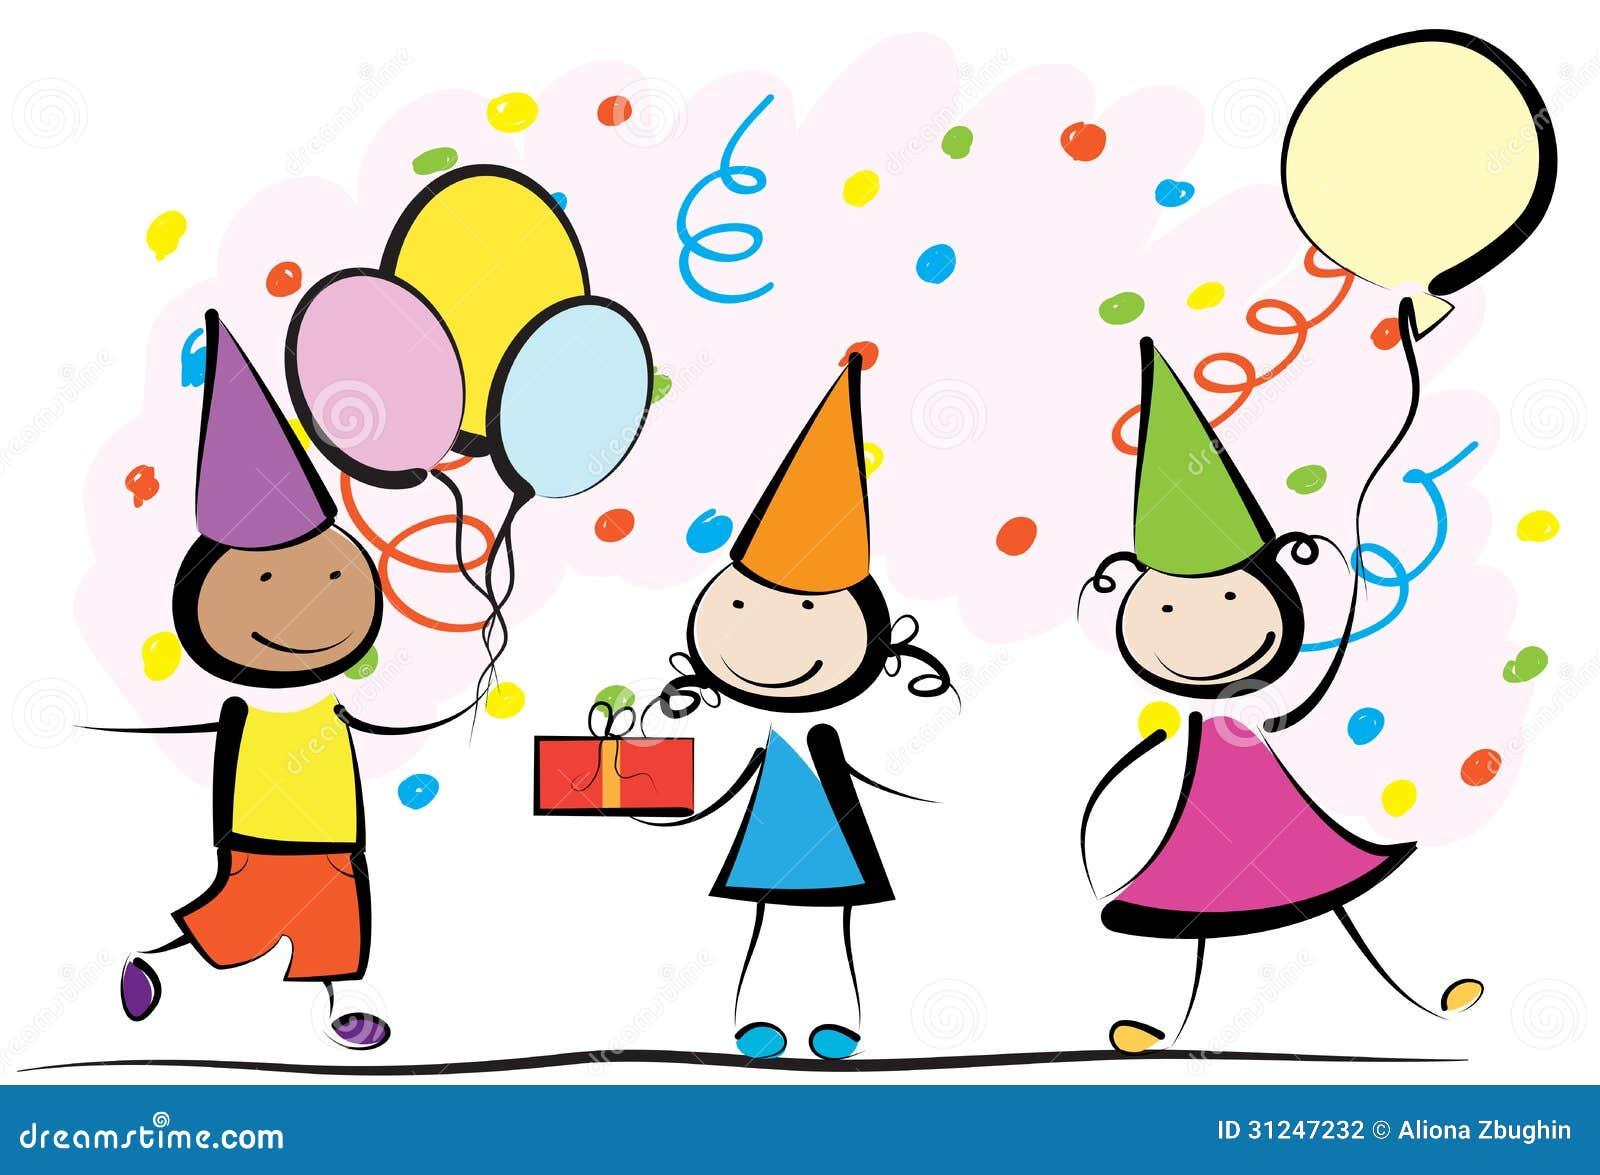 Kids birthday stock vector. Illustration of friends, birthday - 31247232